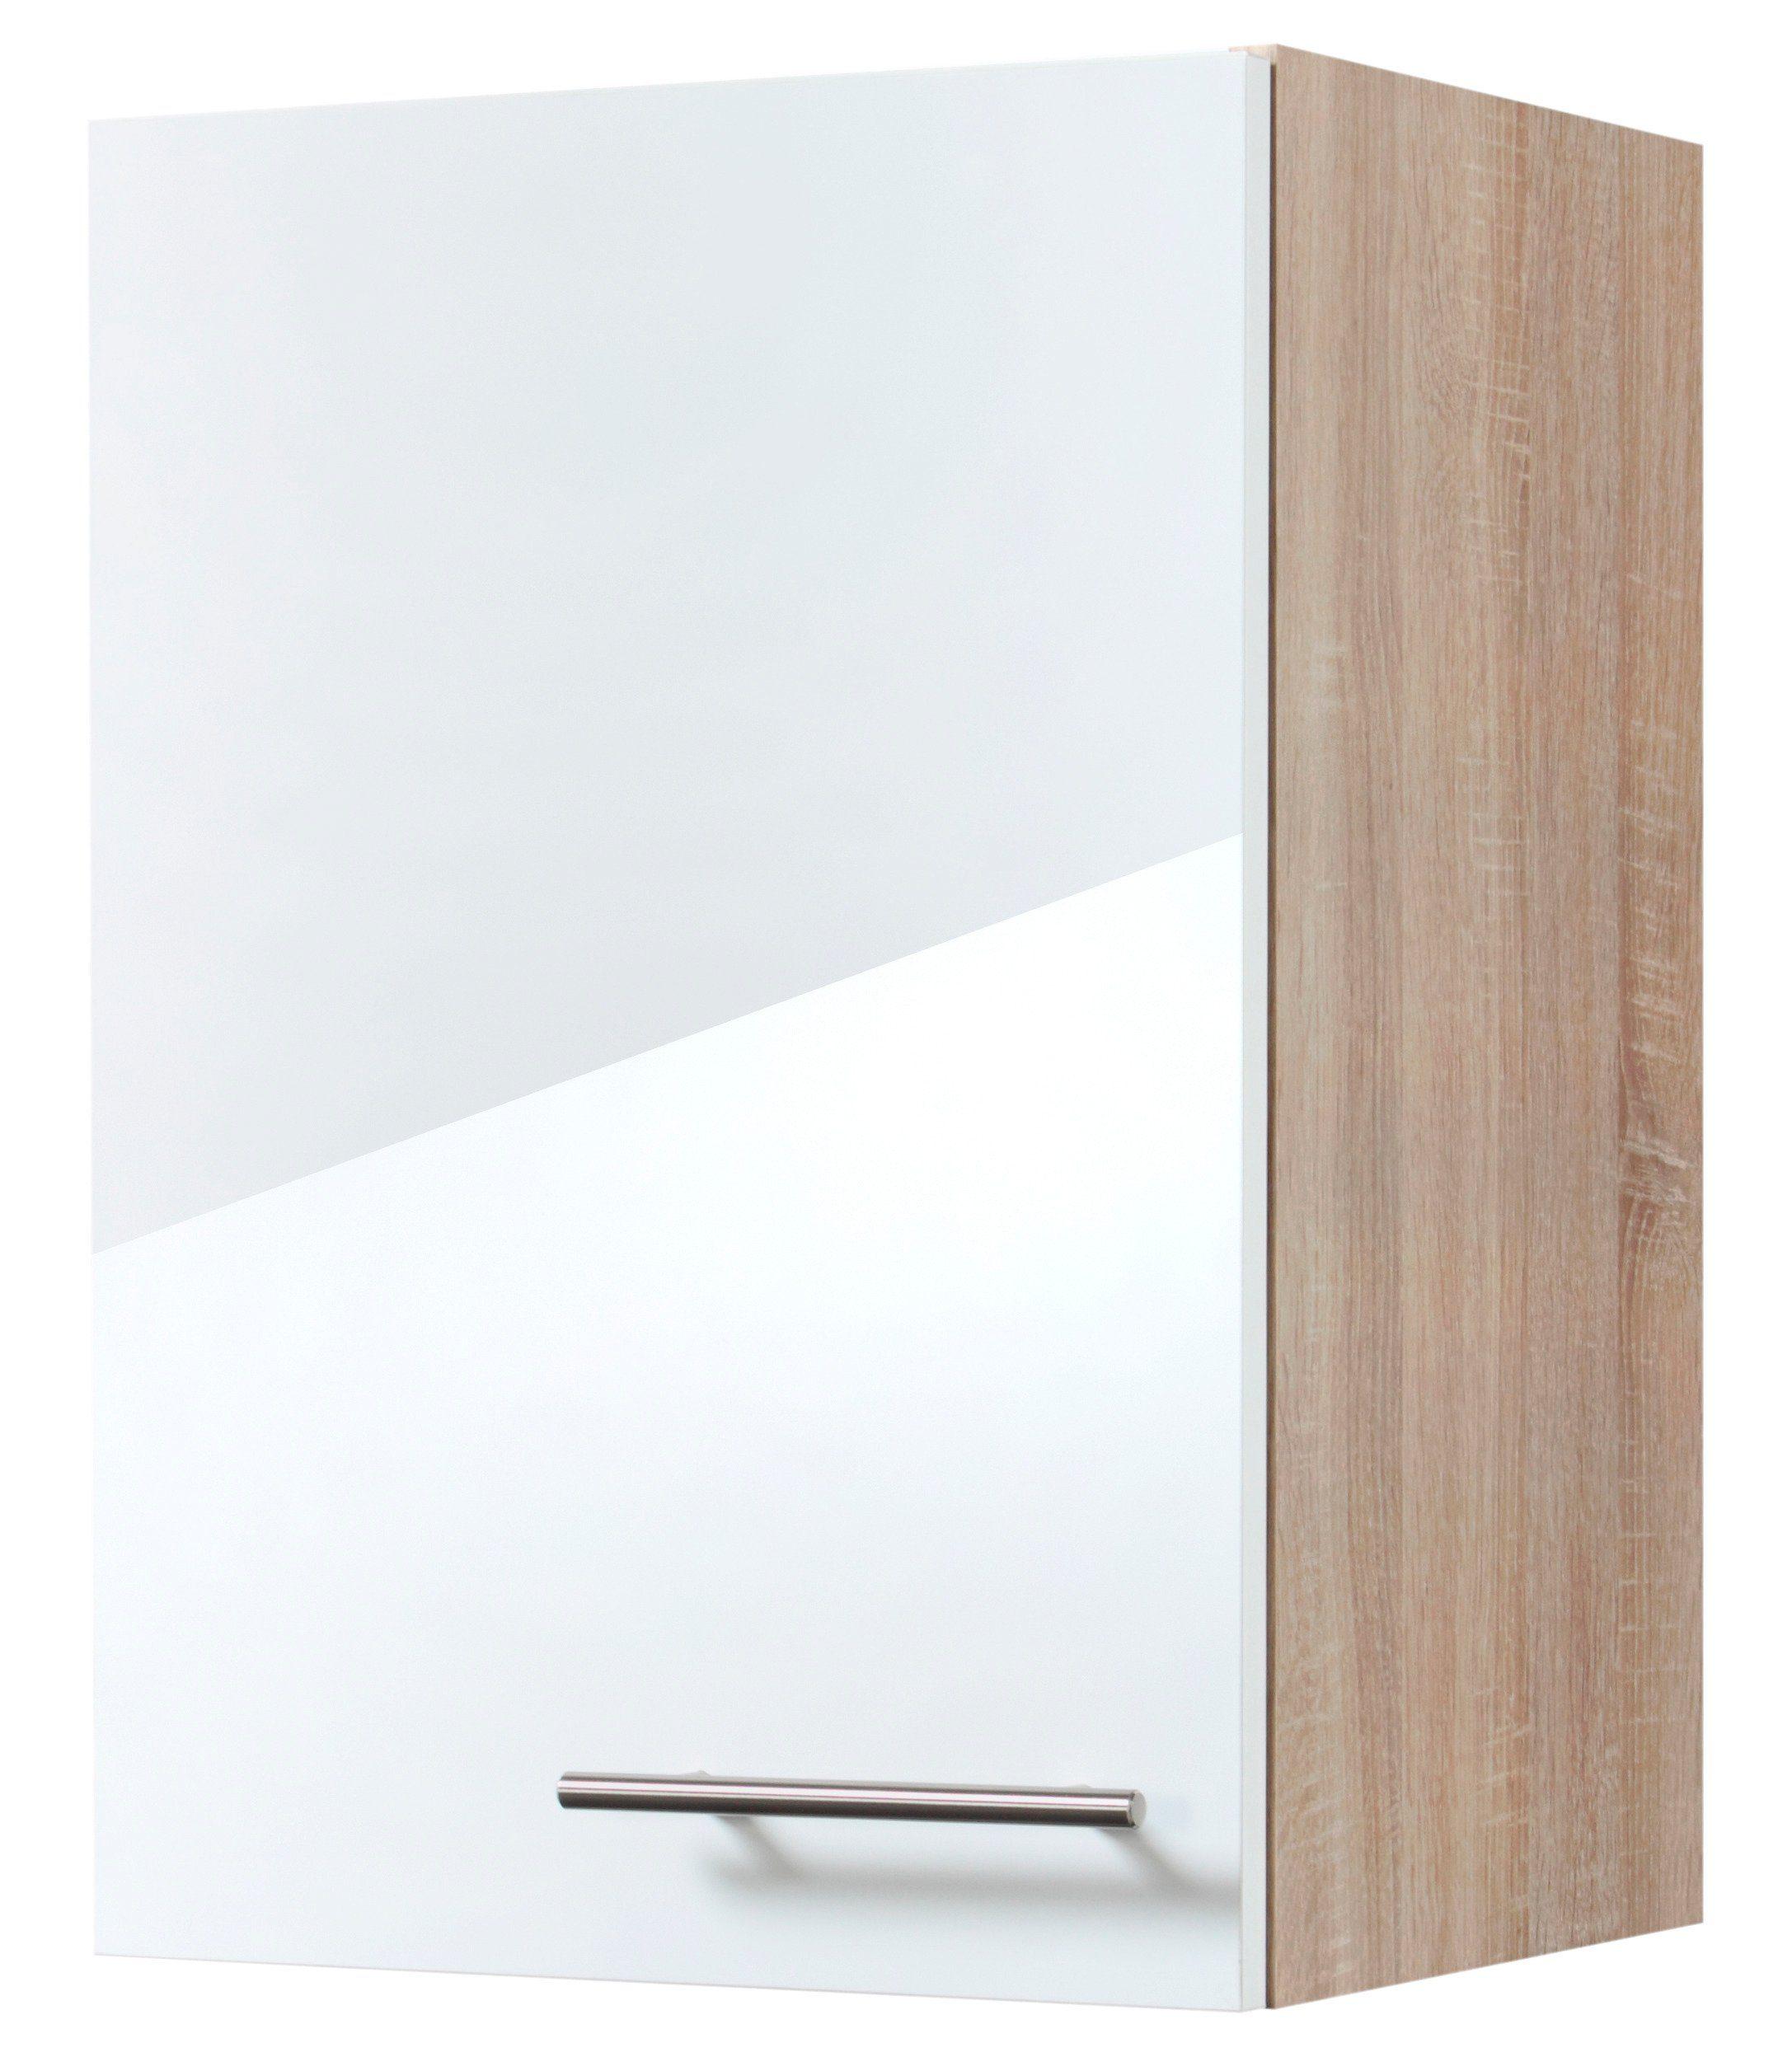 OPTIFIT Küchenhängeschrank »Dakar, Breite 40 cm«